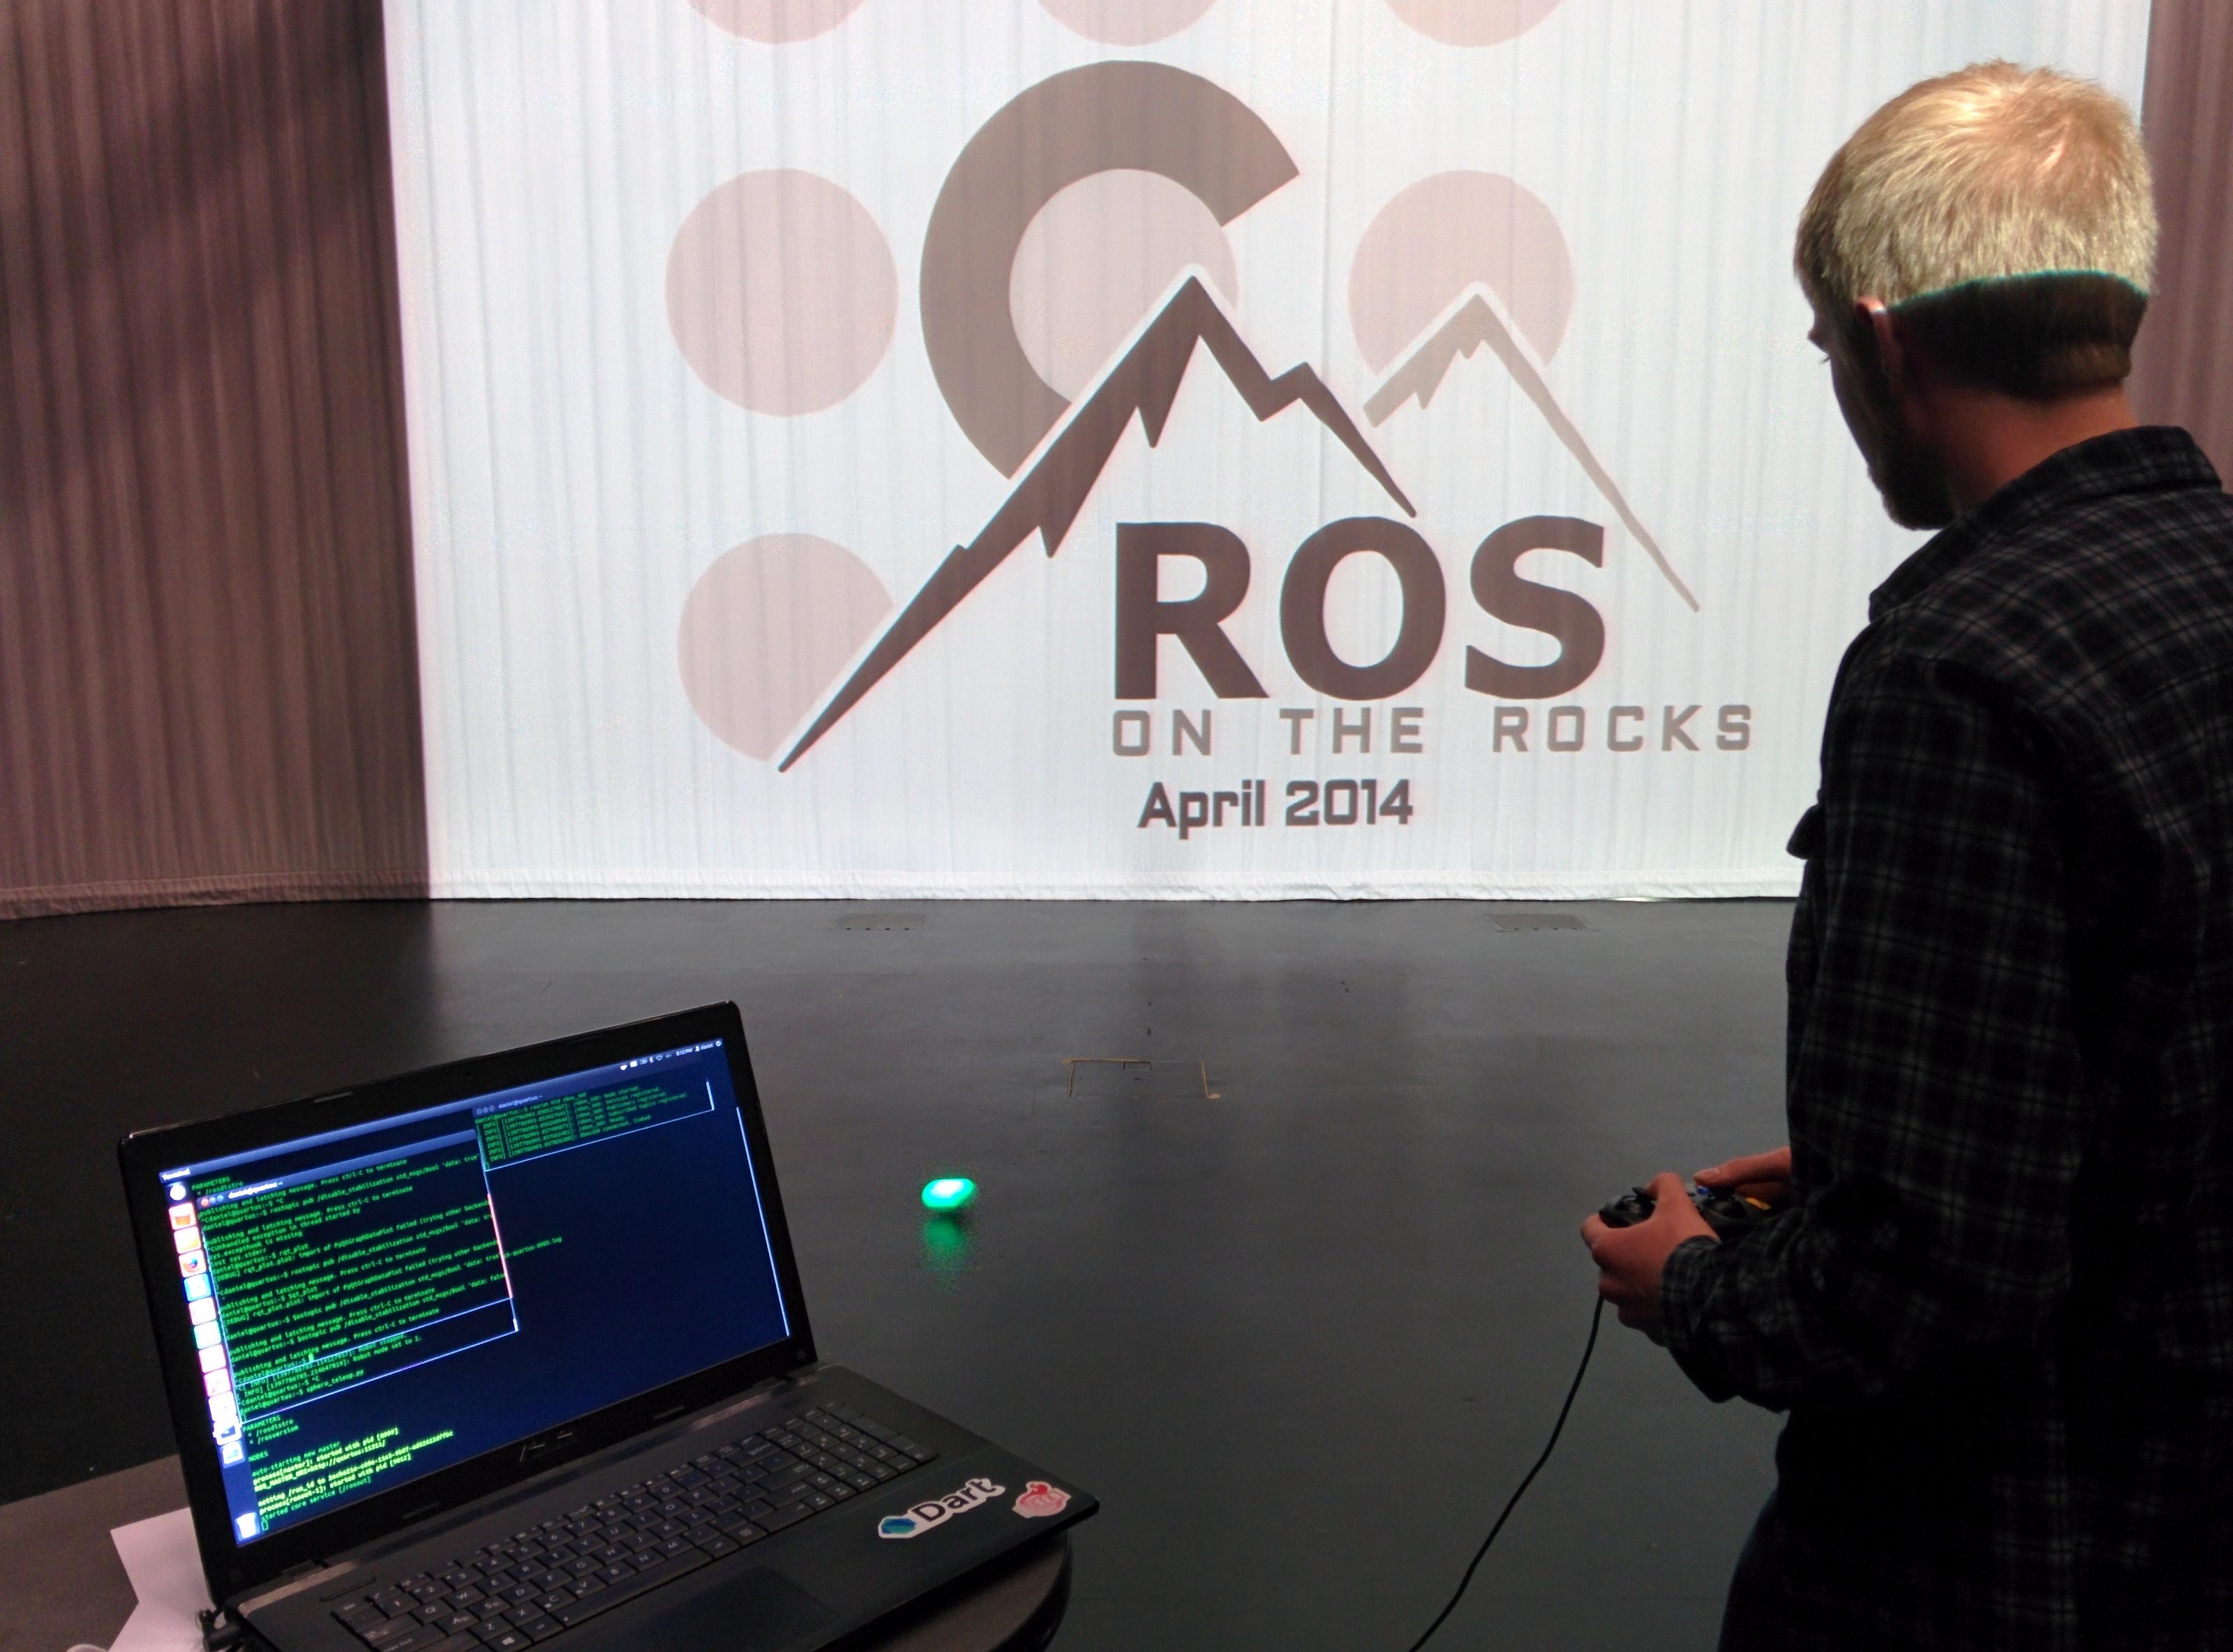 http://www.ros.org/news/2014/04/28/sphero_ros.jpg